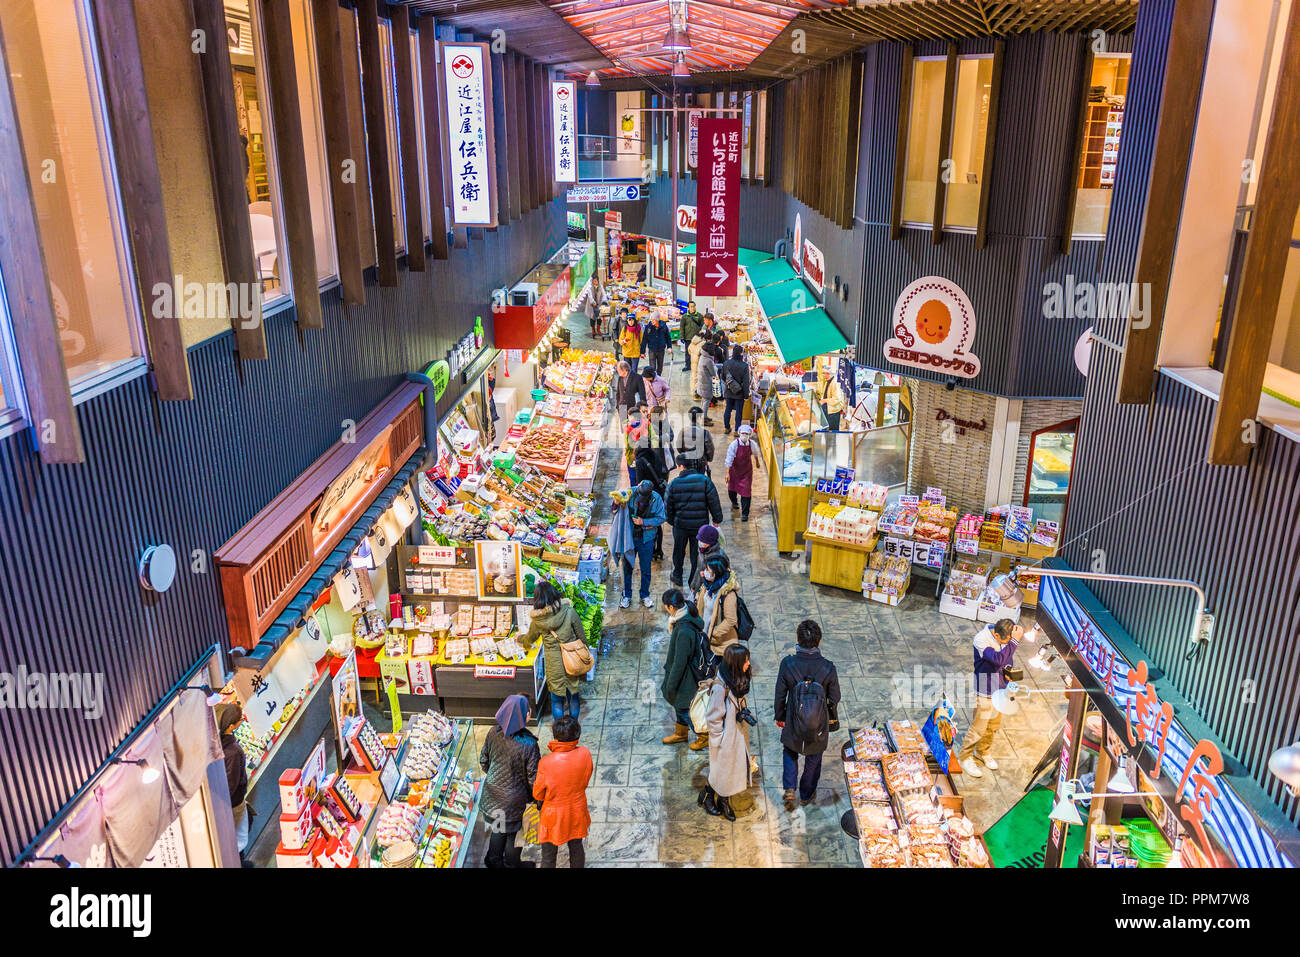 KANAZAWA, JAPAN - JANUARY 20, 2017: Early morning shoppers peruse fresh seafood at the the Omicho Market. - Stock Image